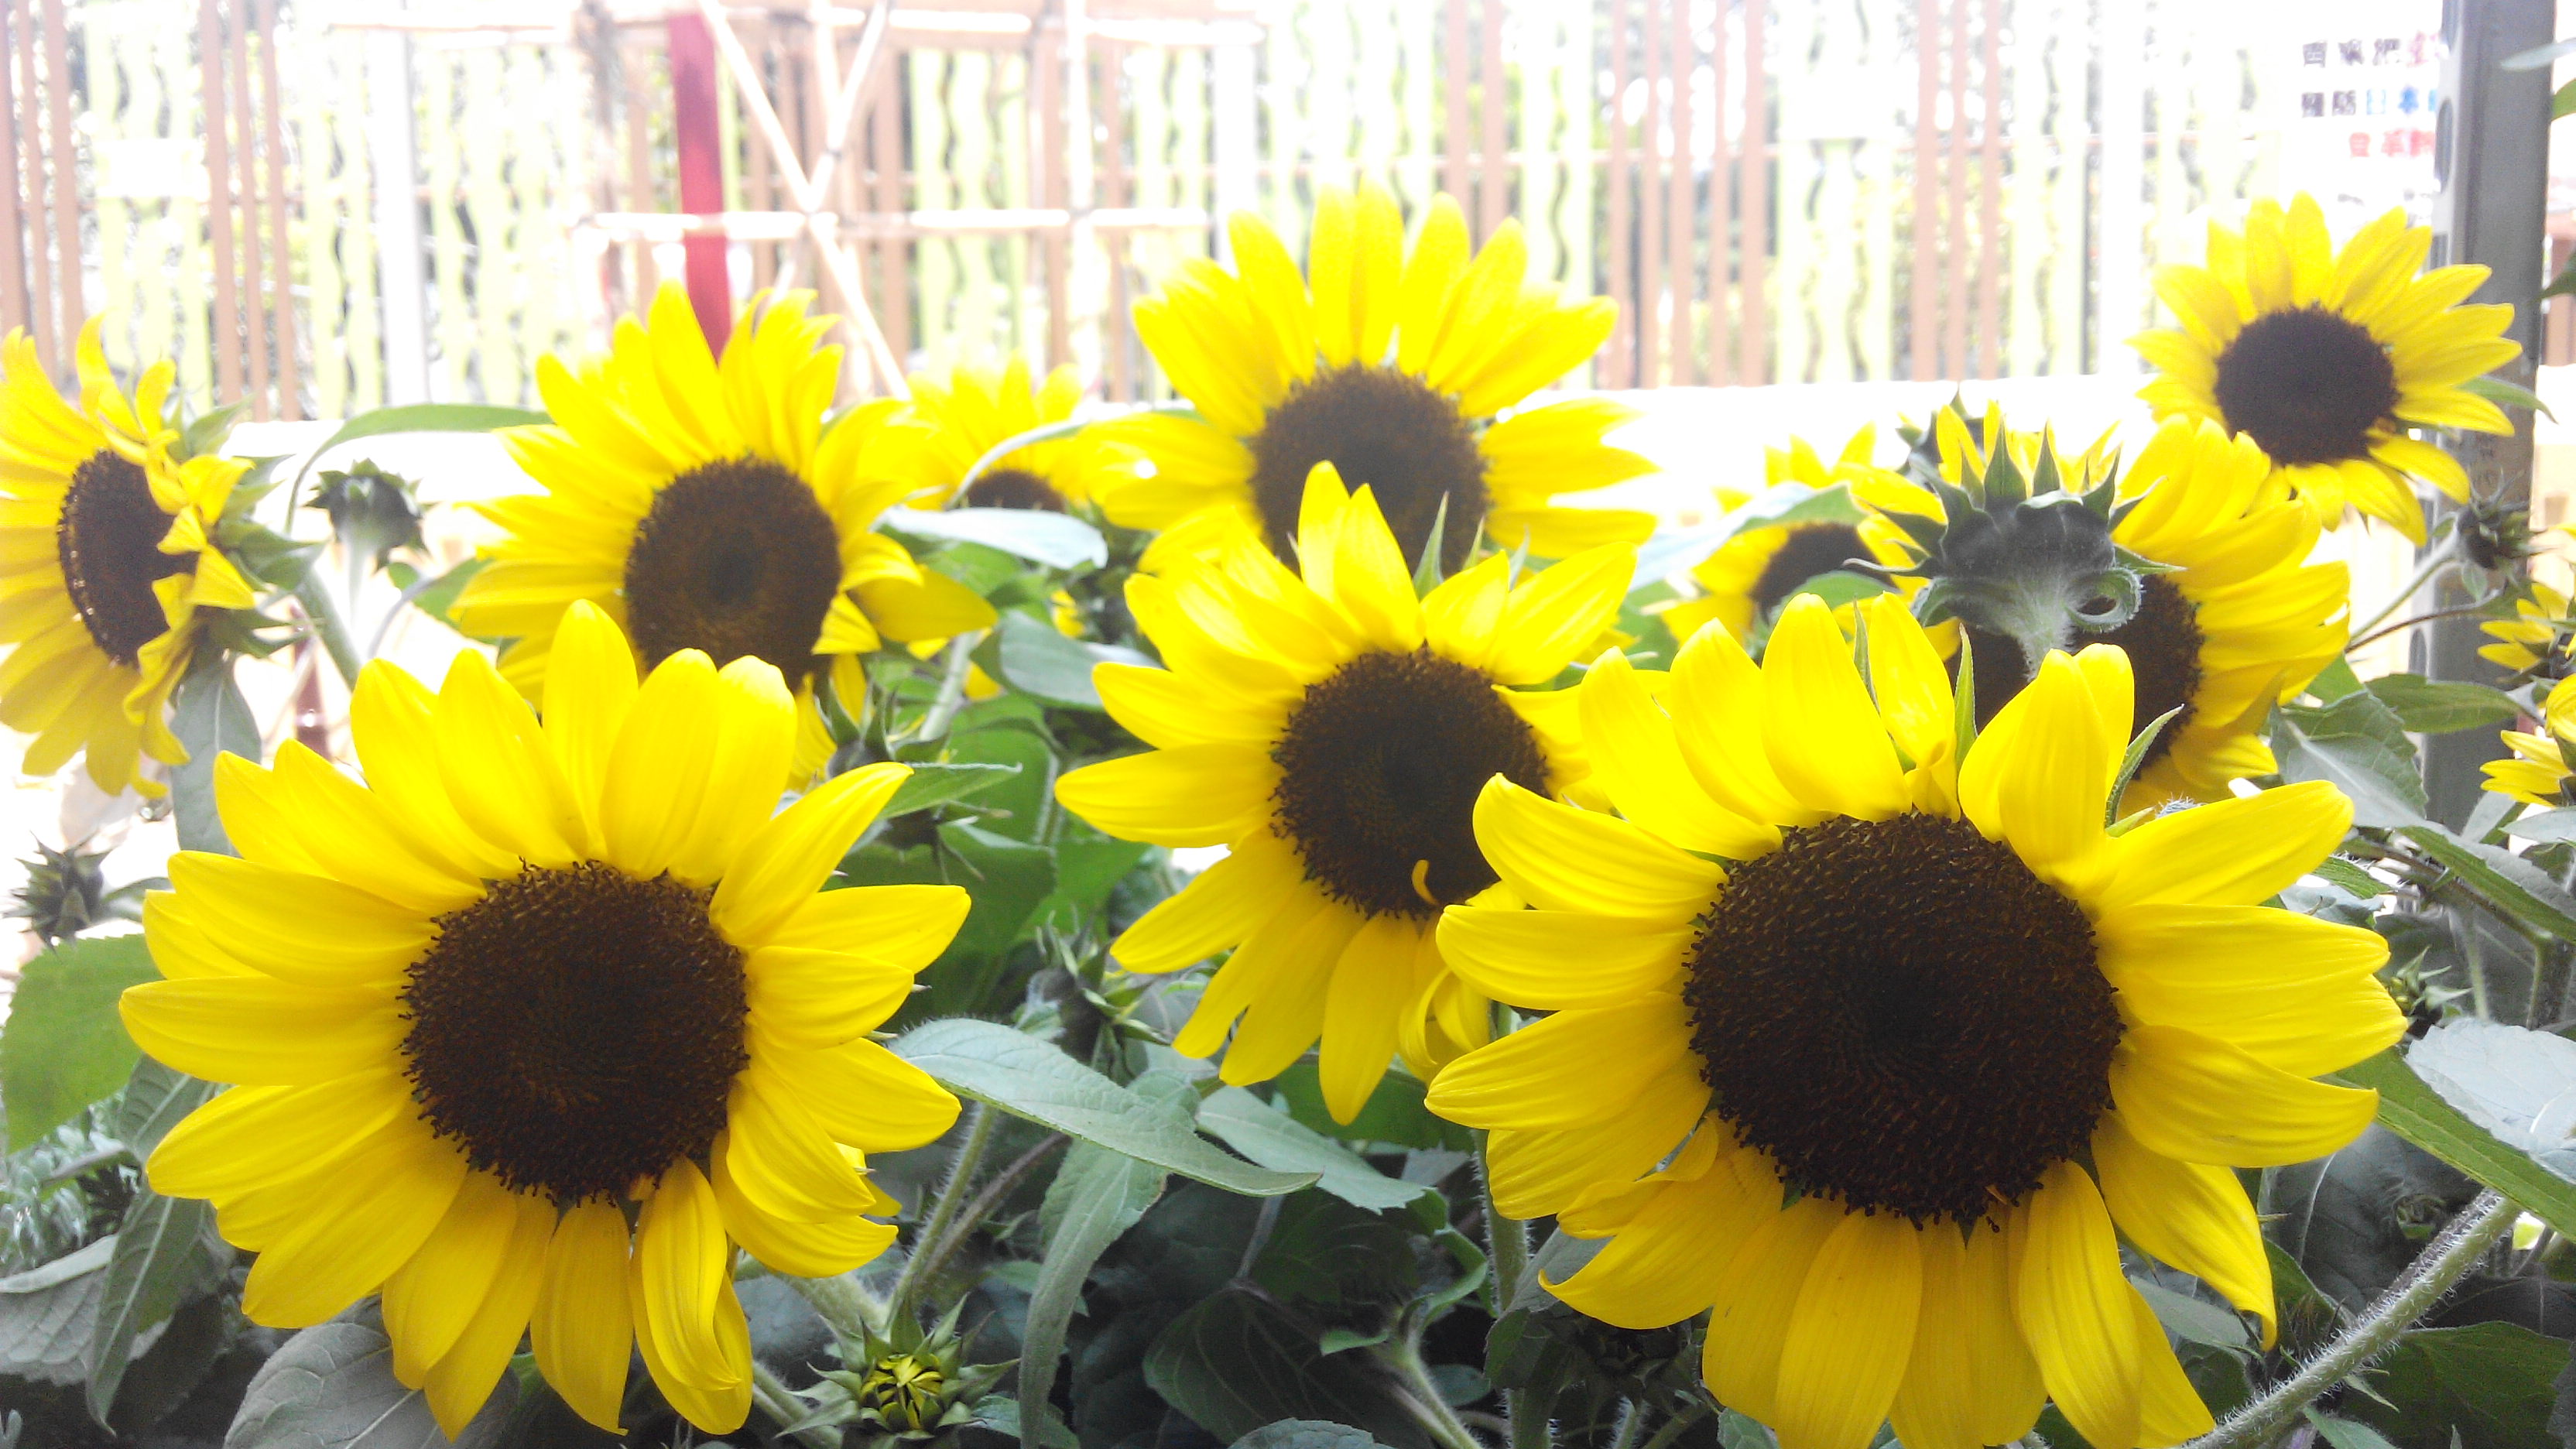 Filehk Mongkok Flower Market Road Yellow Daisy Sunflowers April